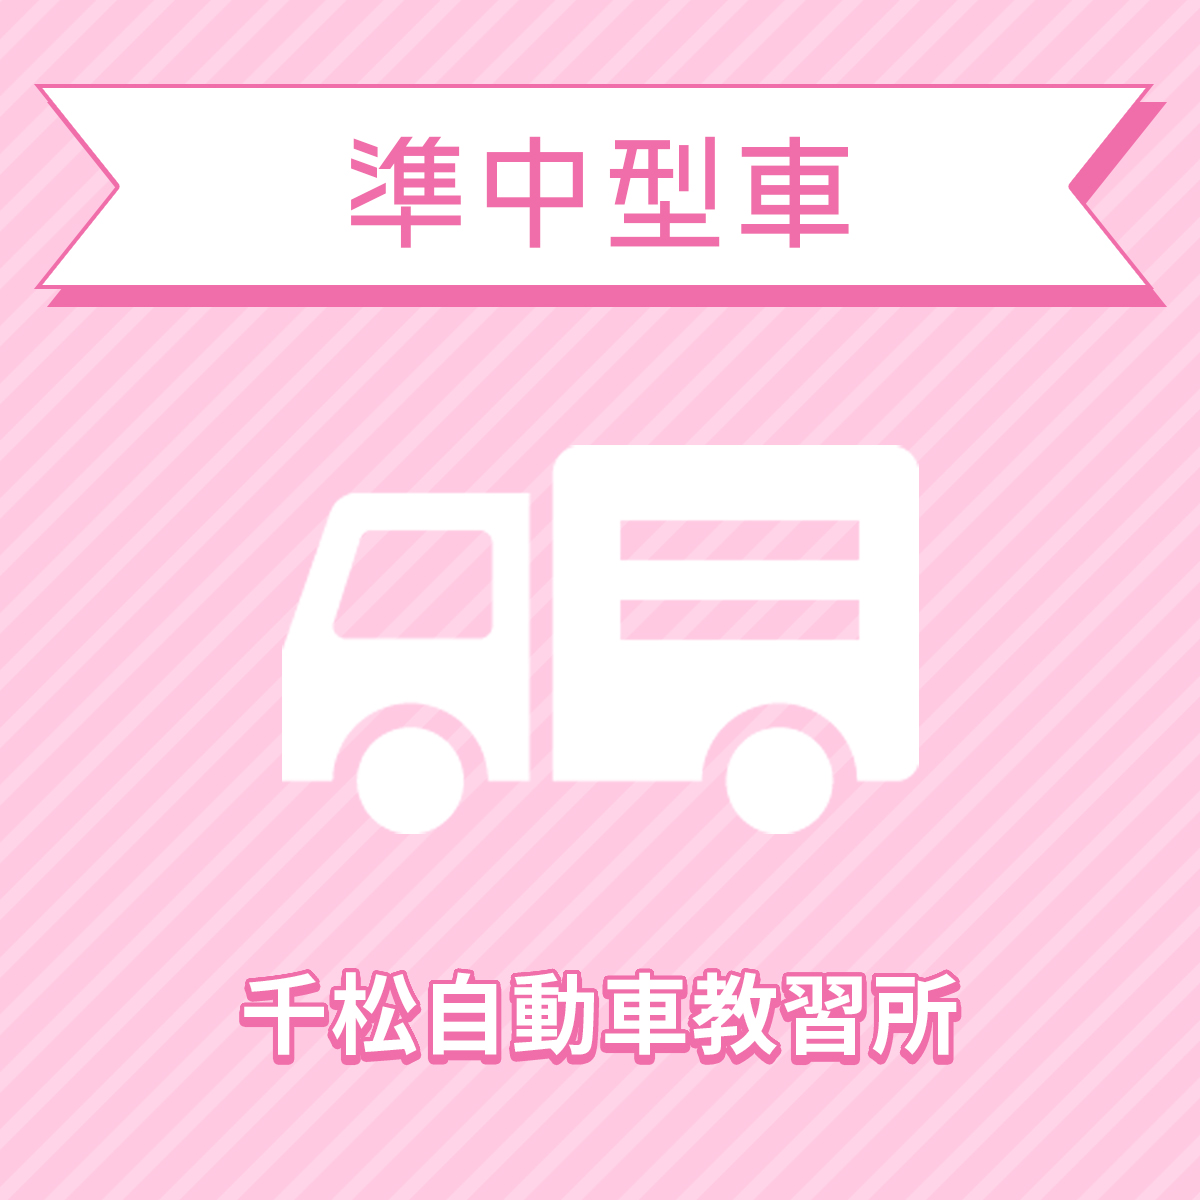 【徳島県徳島市】準中型コース<免許なし/原付免許所持対象>